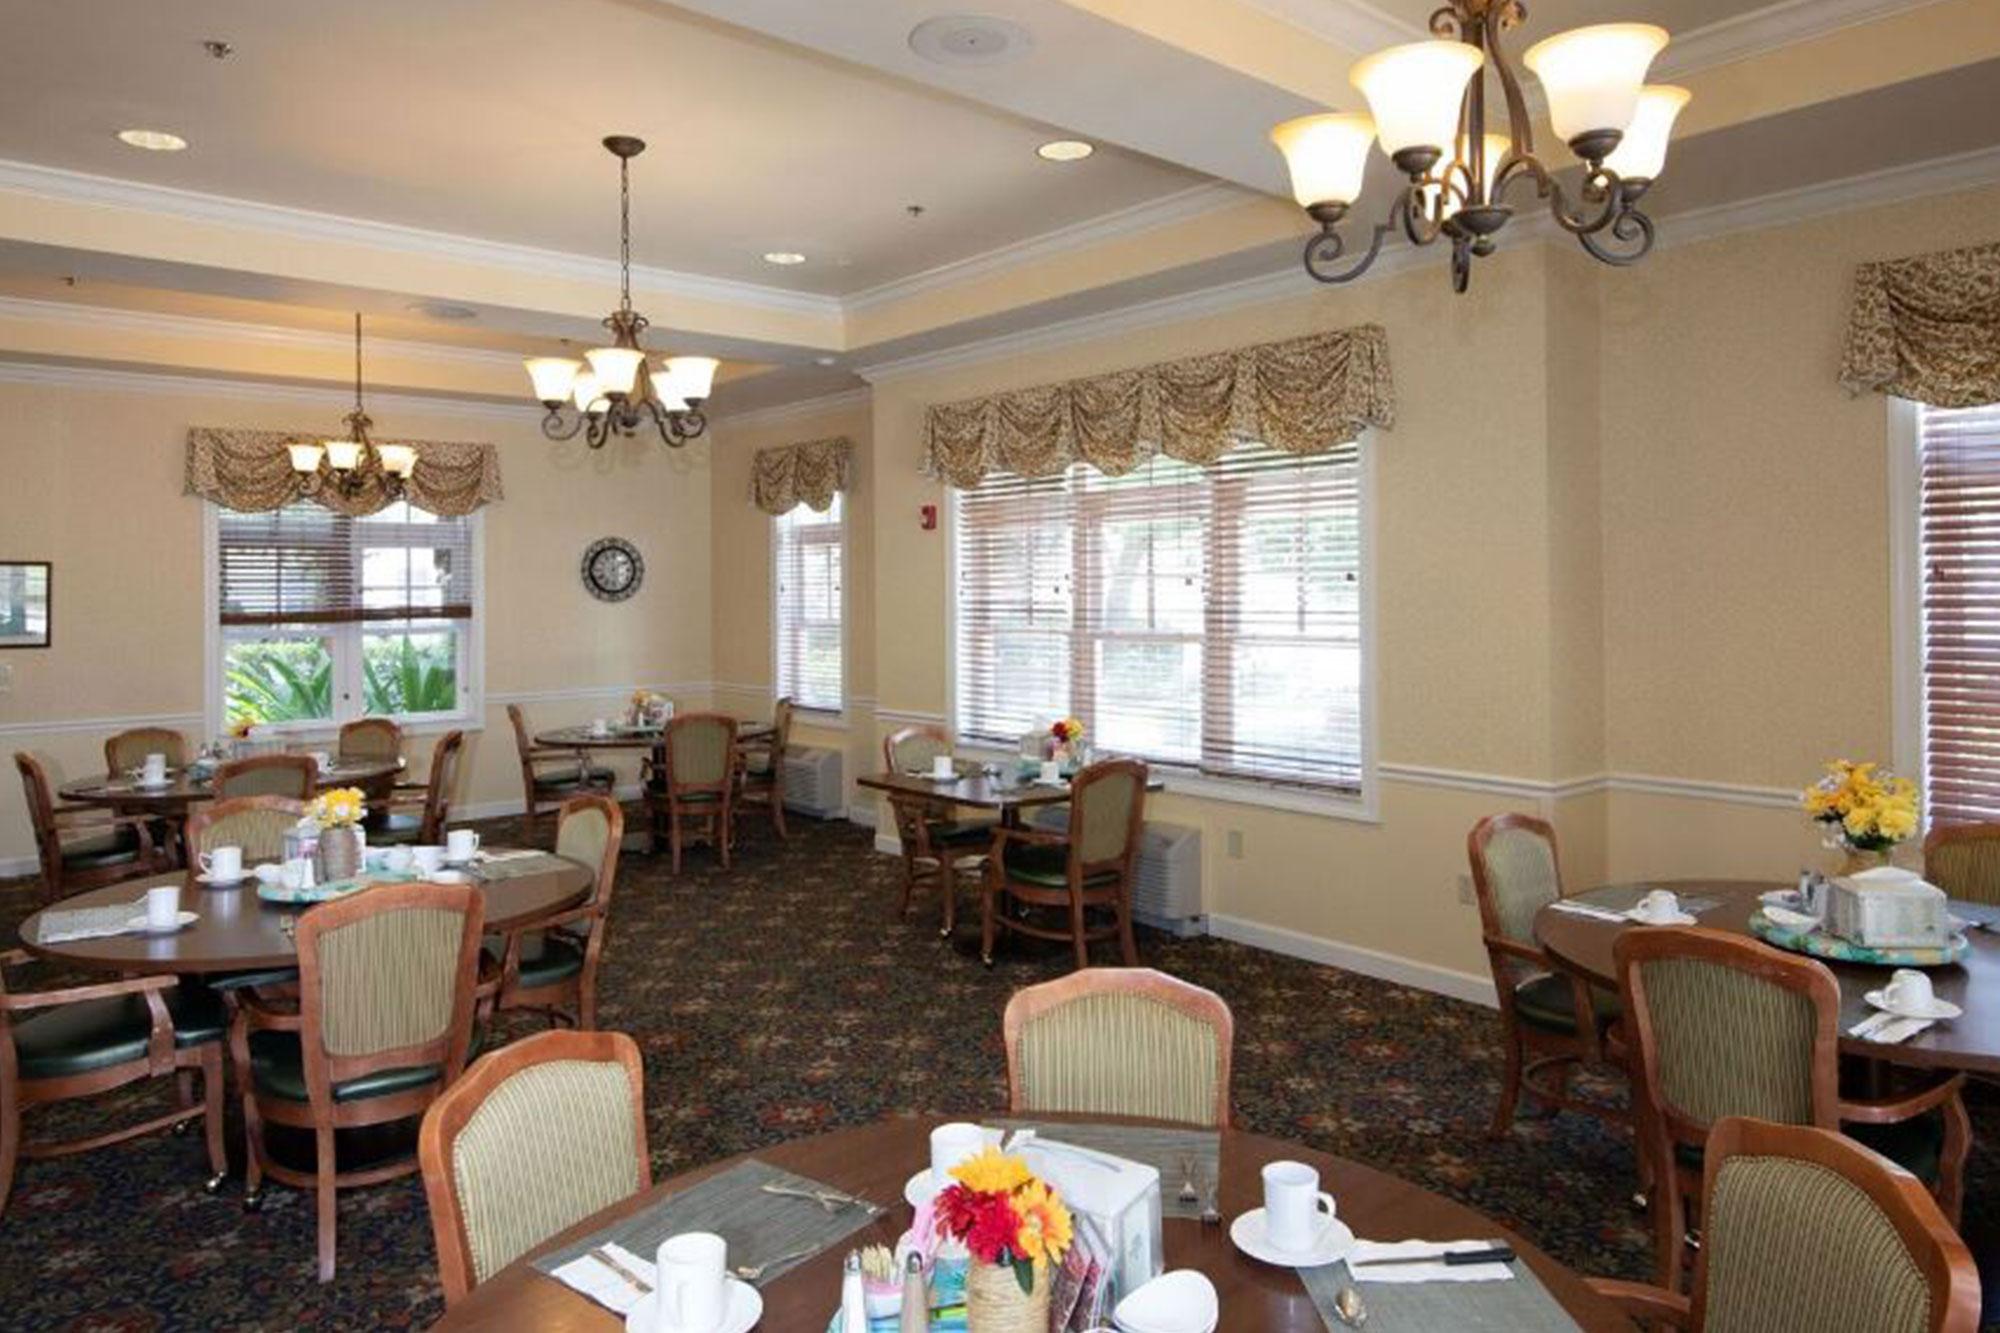 Grand Oaks of Okeechobee Main Dining Room